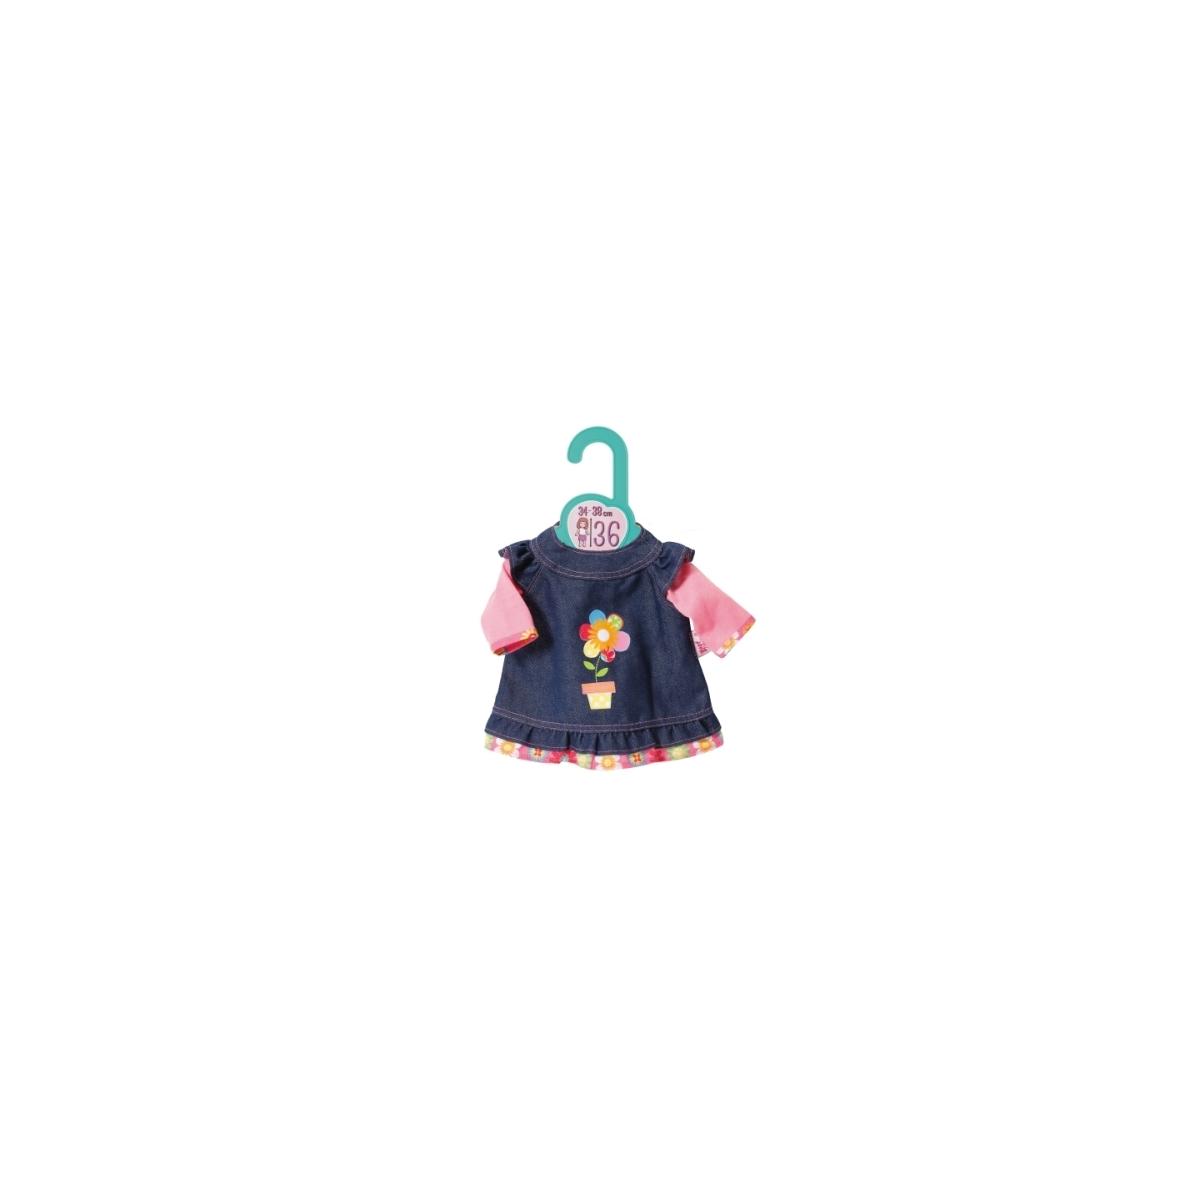 Dolly Moda 34-38 cm Zapf Creation 870754 Jeanskleid